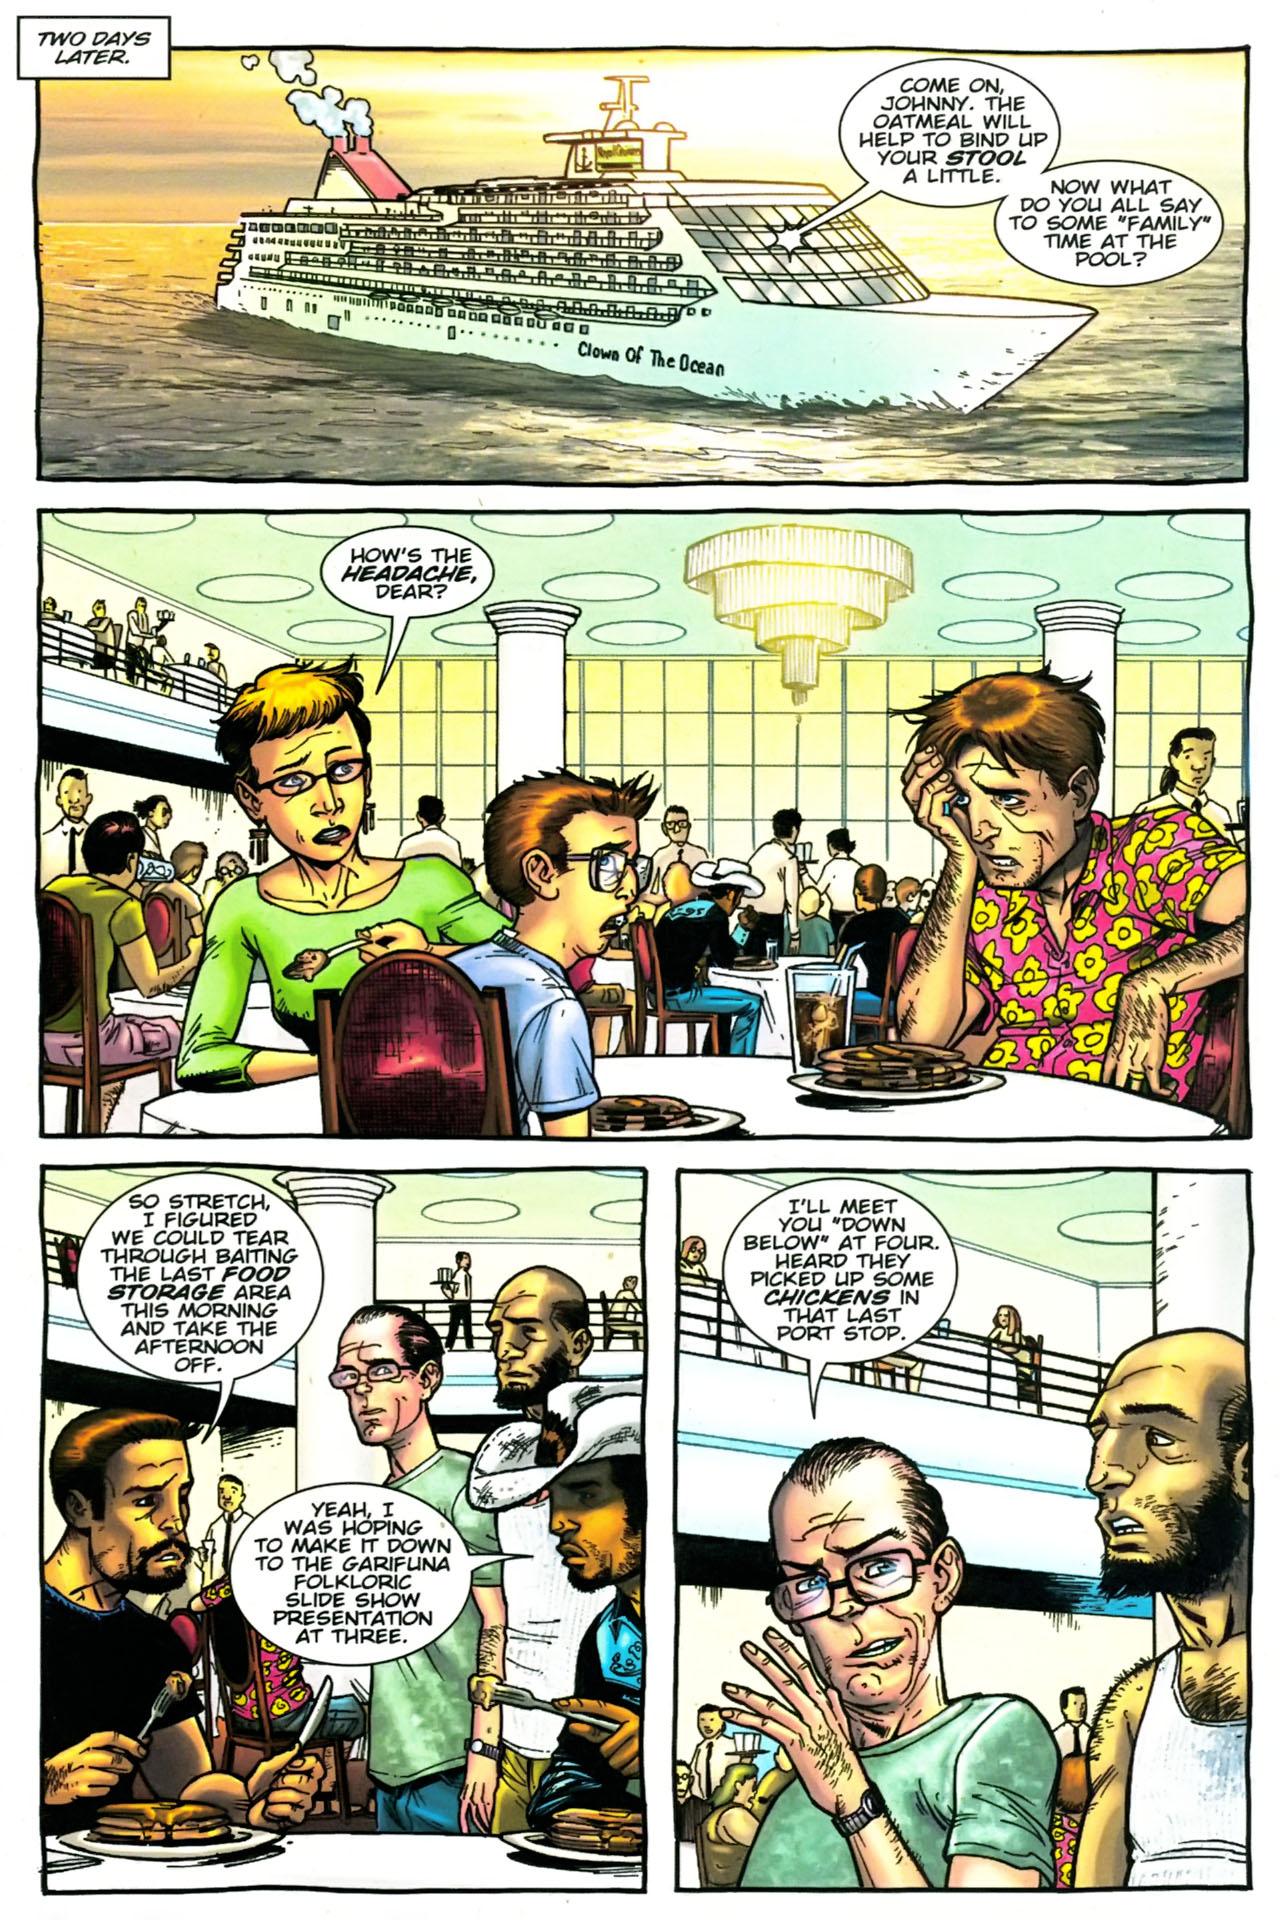 Read online The Exterminators comic -  Issue #24 - 4